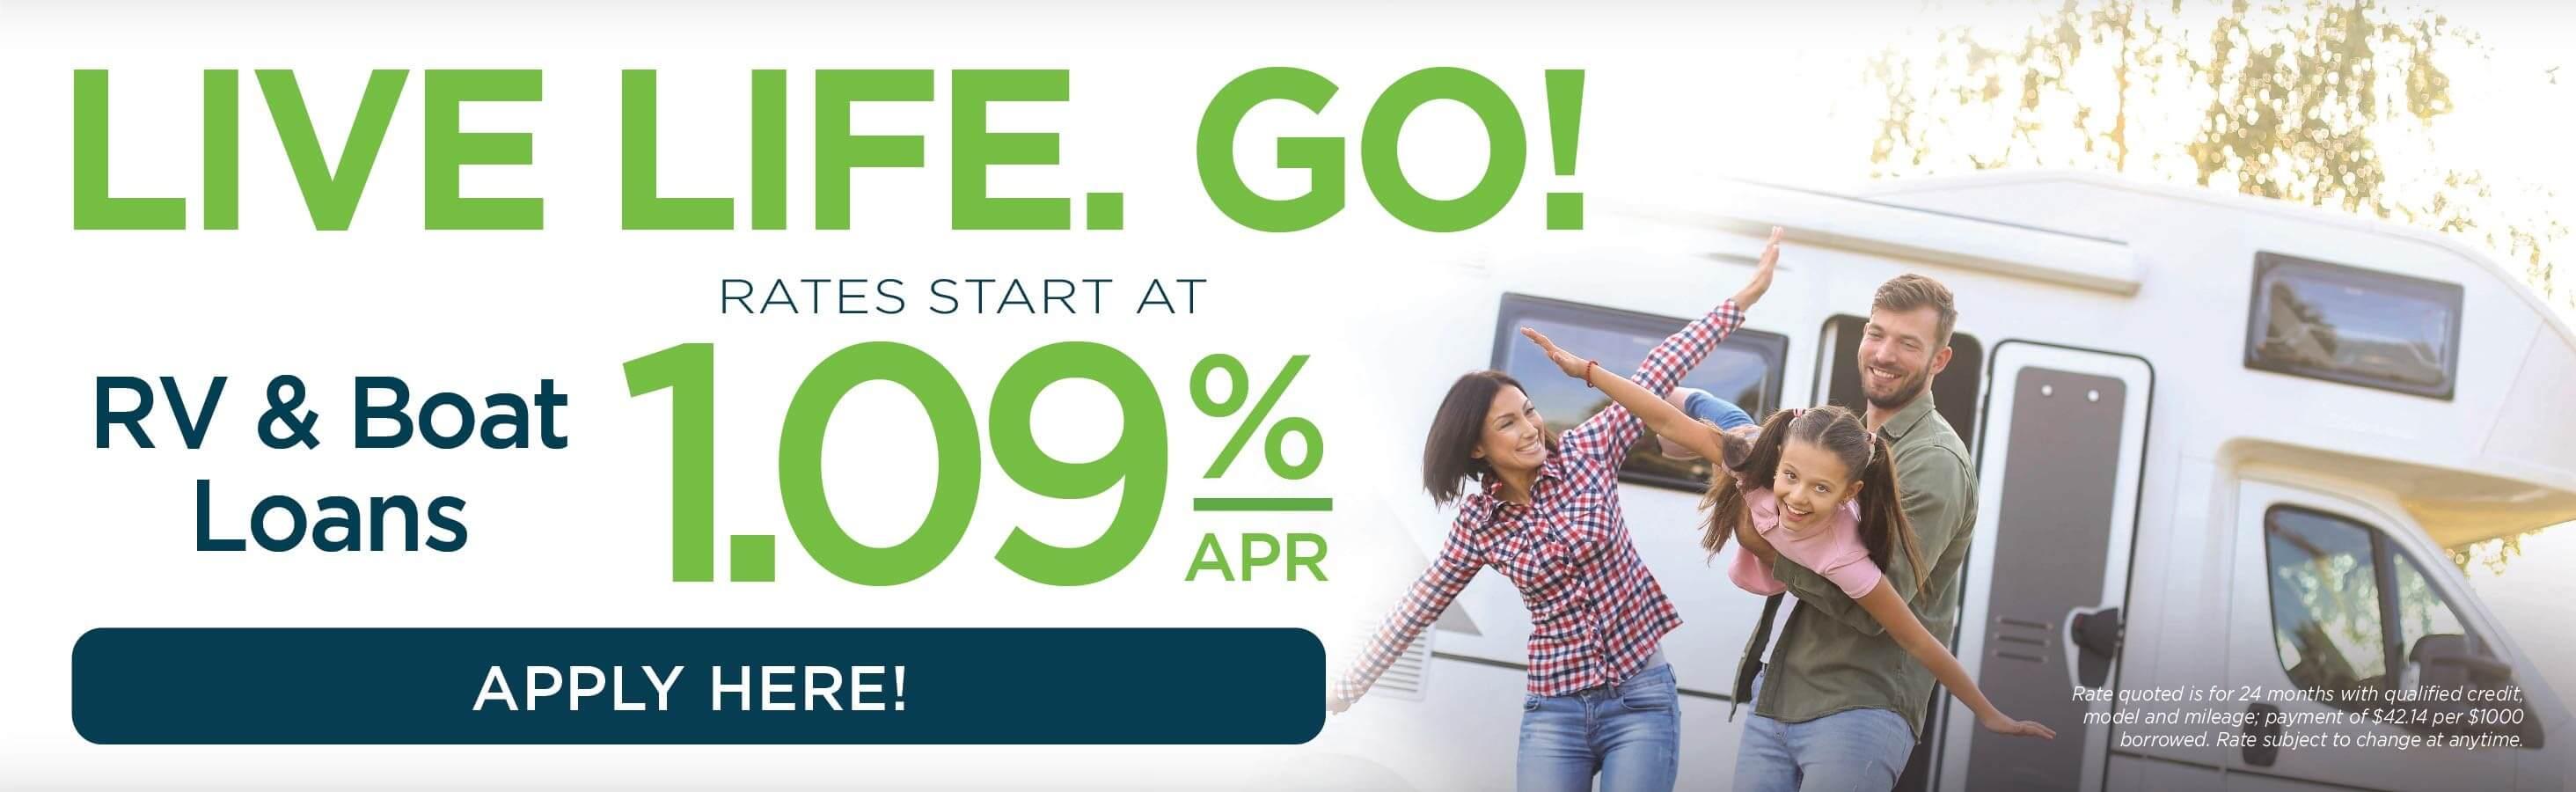 Live Life. Go! RV & Boat Loan Promotion